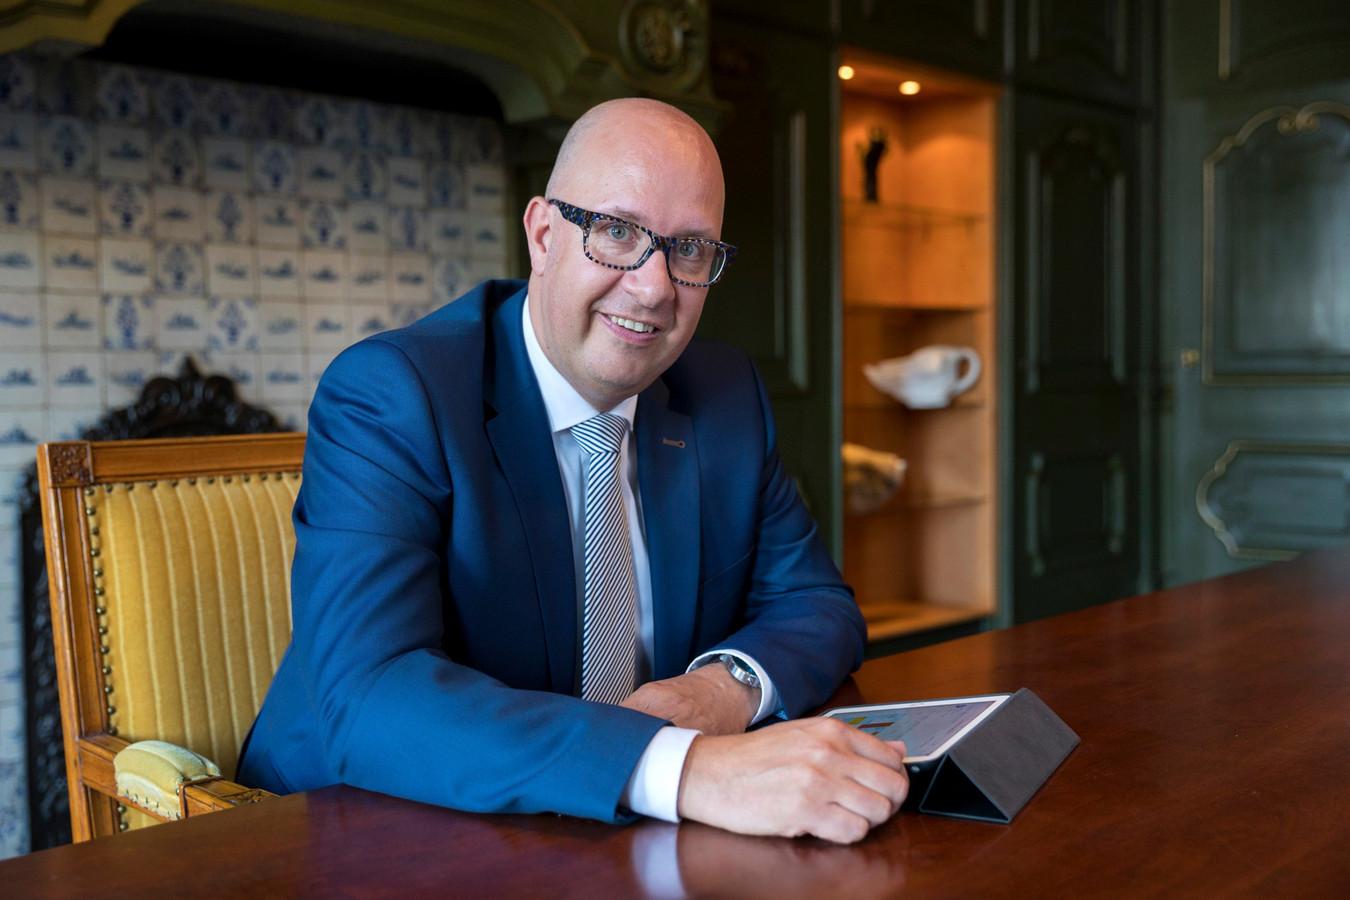 Nederland,  Den Bosch, burgemeester van Den Bosch Jack Mikkers